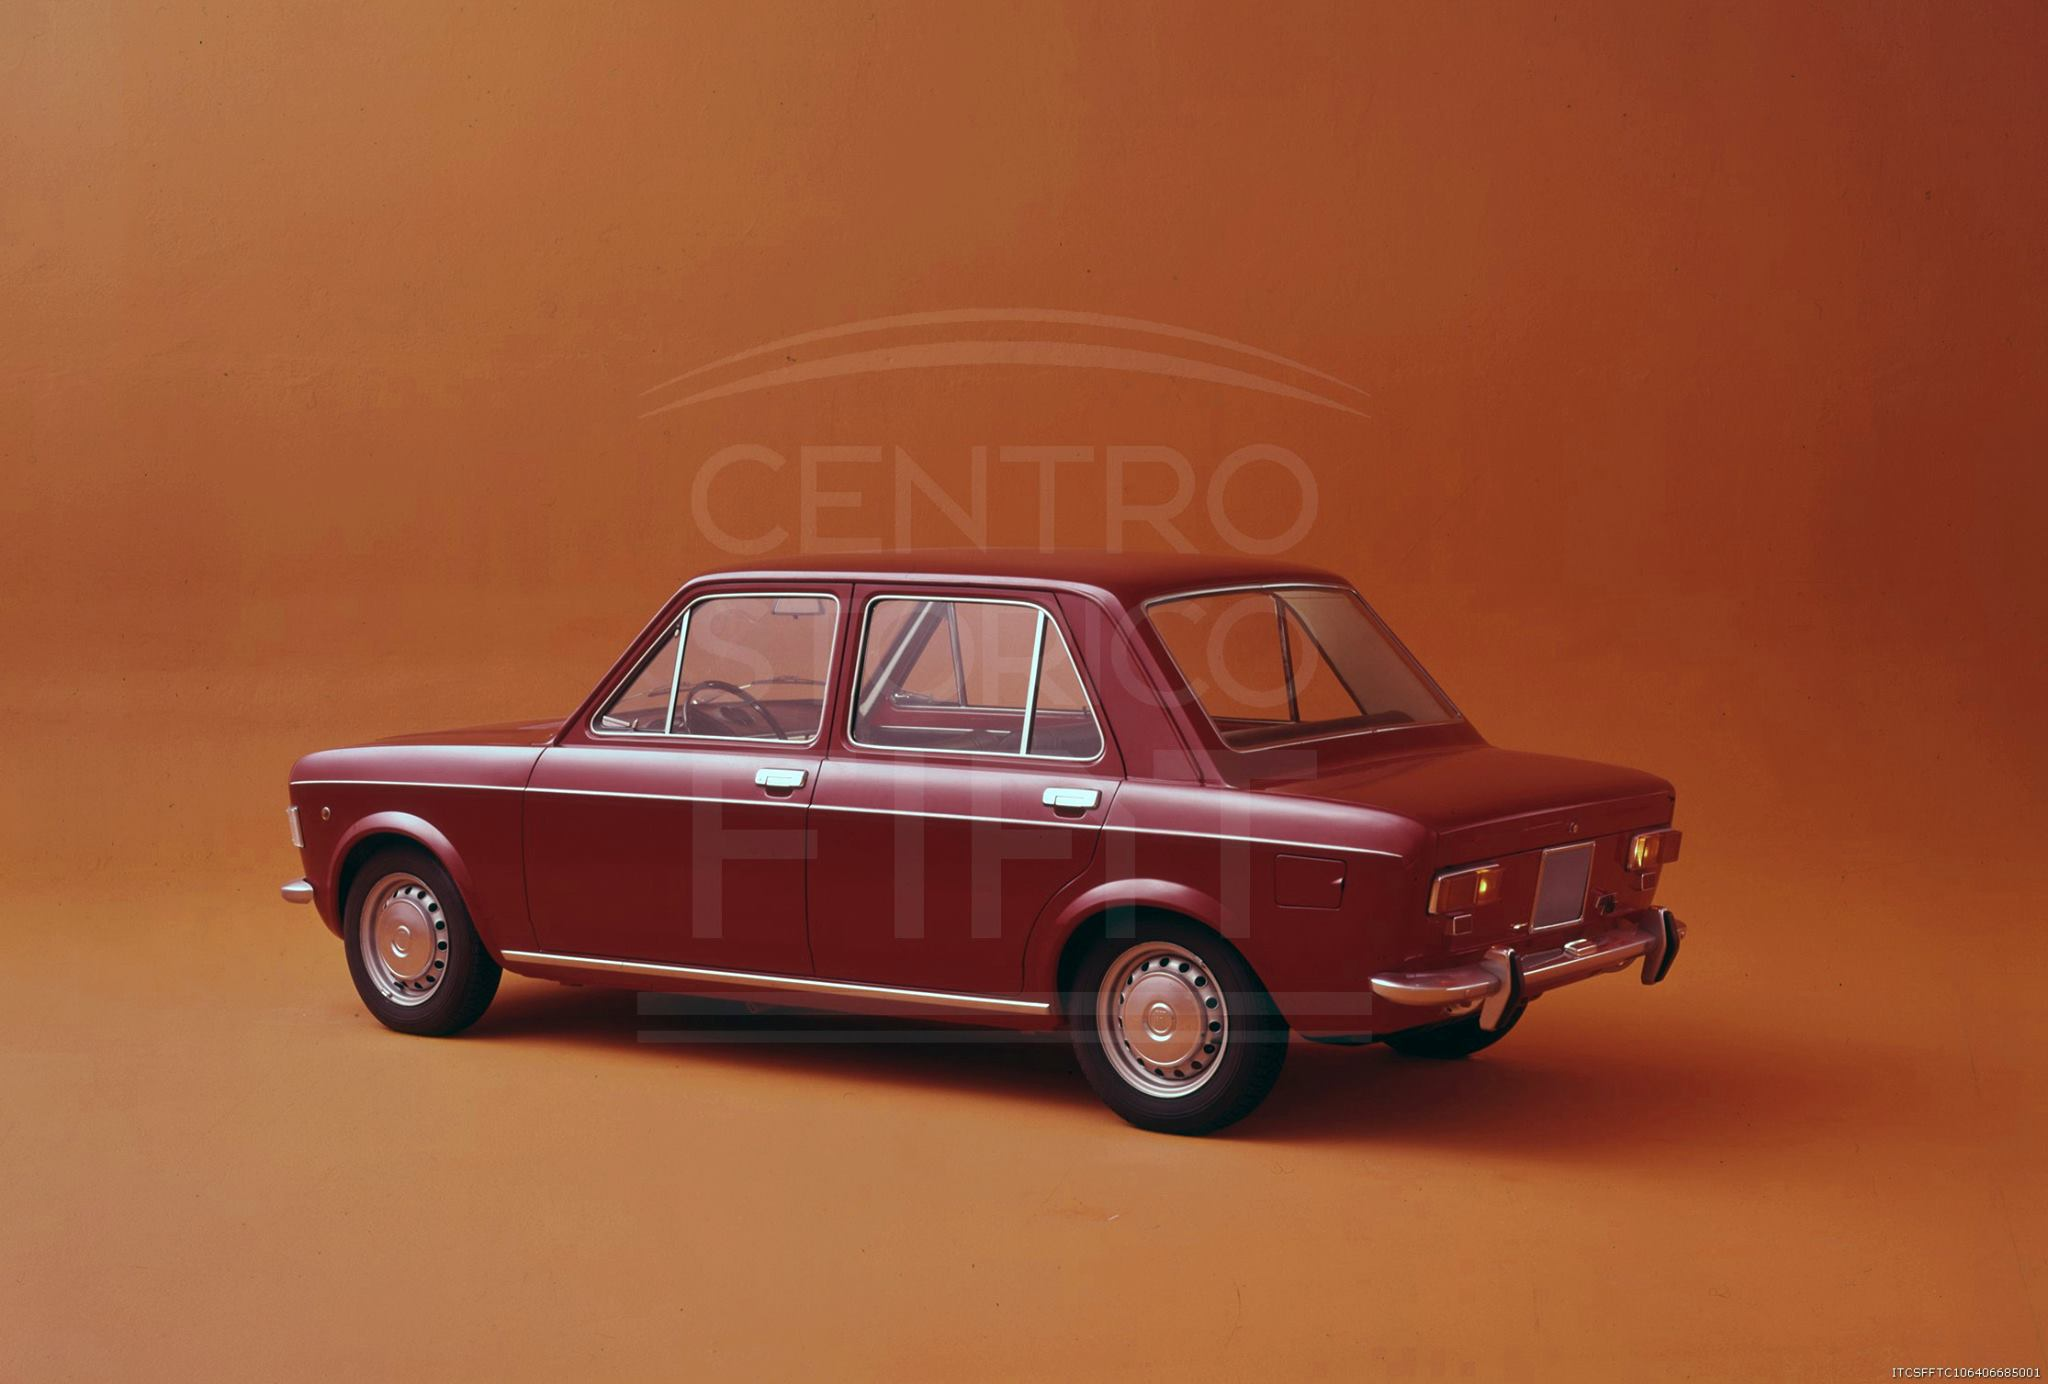 1969_Fiat128-4porte_2019-04-01.jpg